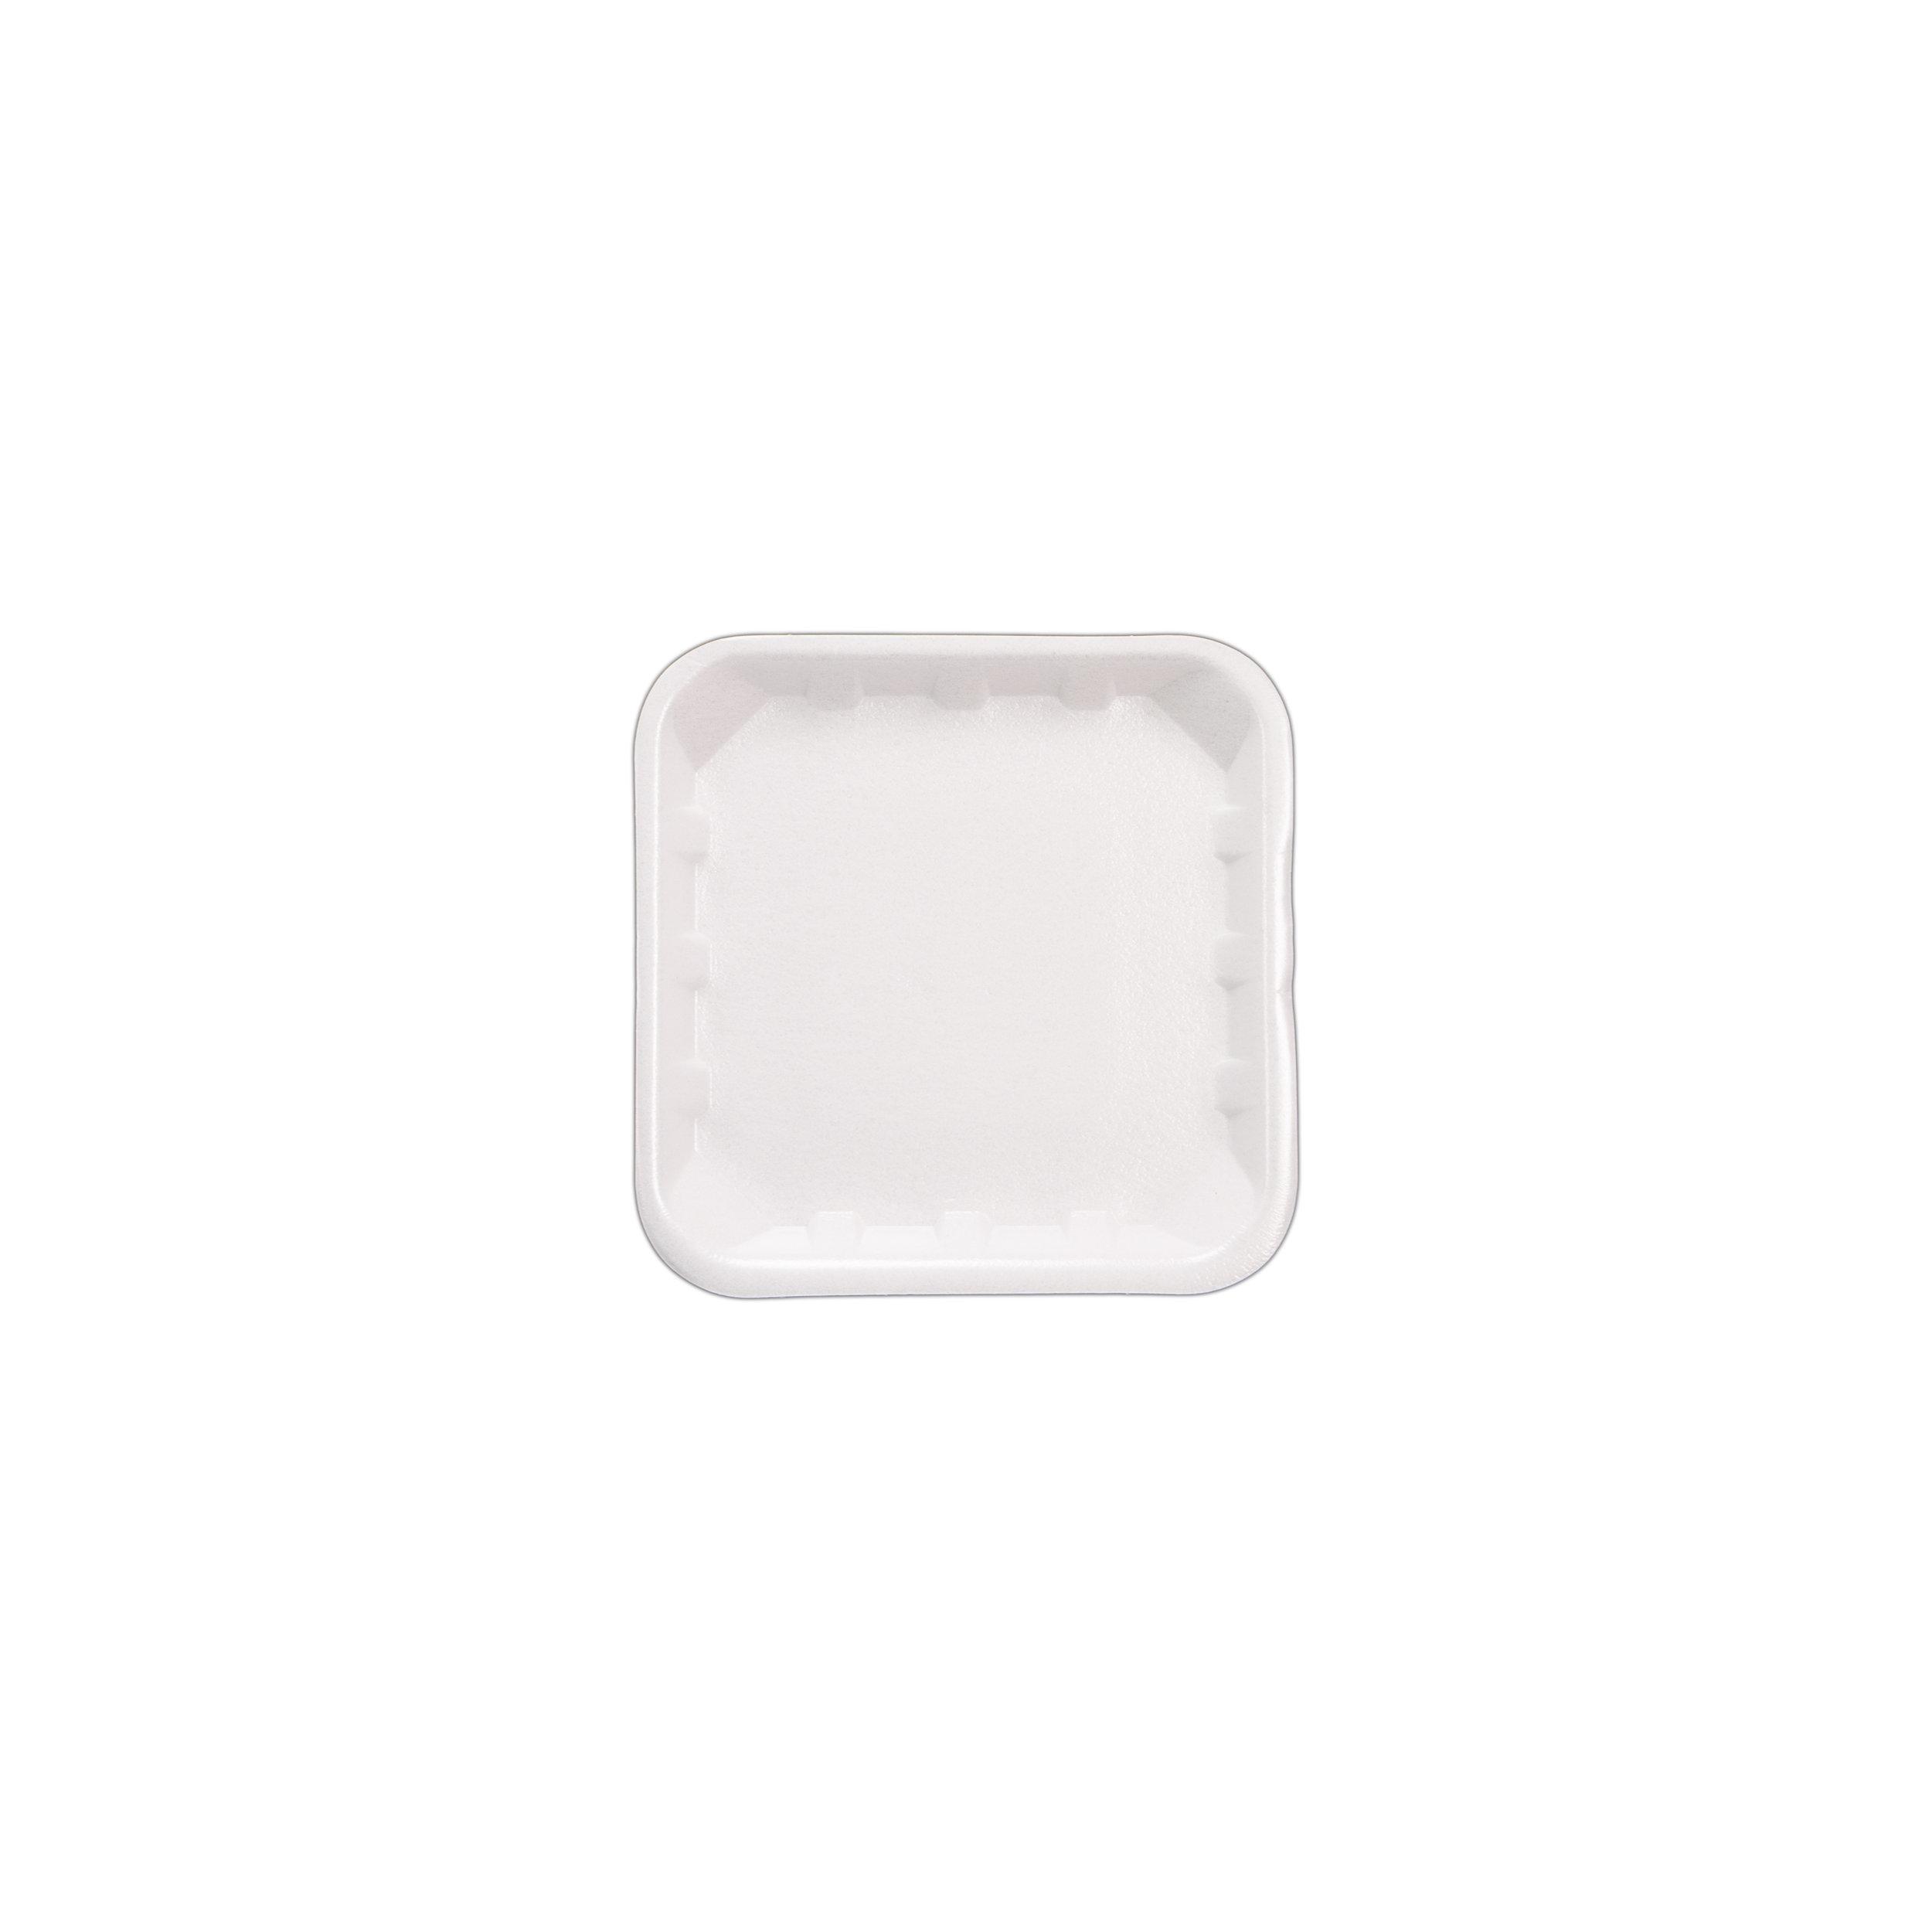 iK0309      CLOSED CELL SHALLOW 5x5    125 per sleeve 1000 per carton